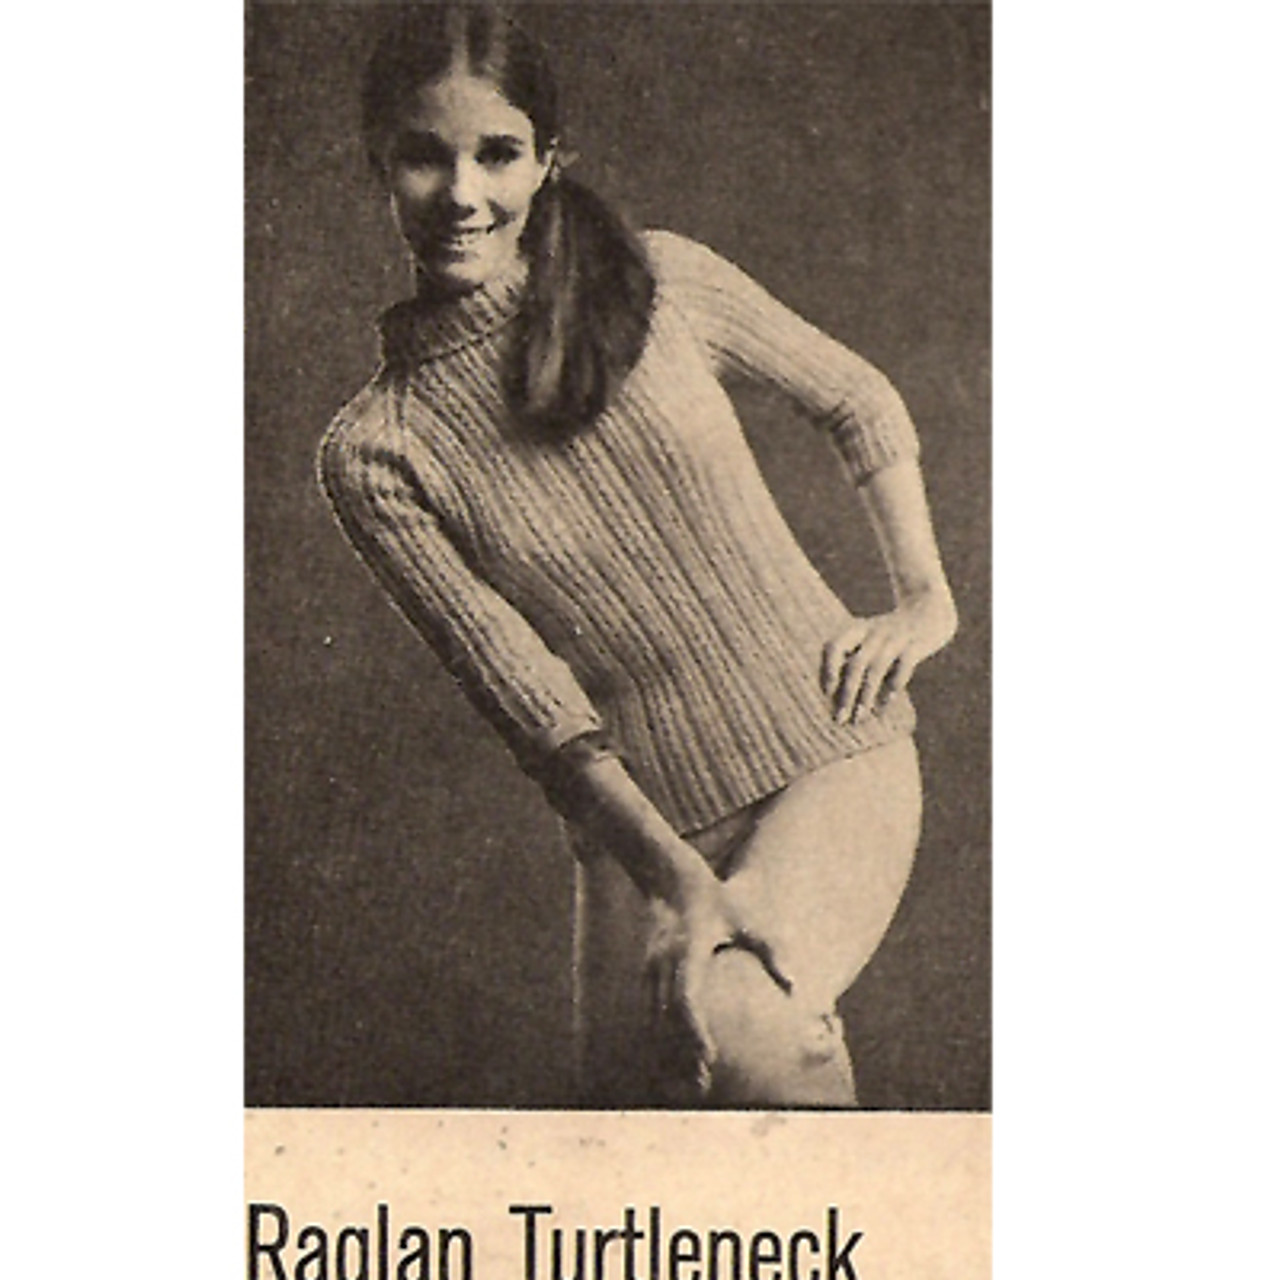 Vintage Half Sleeves Pullover in Reynolds Classique